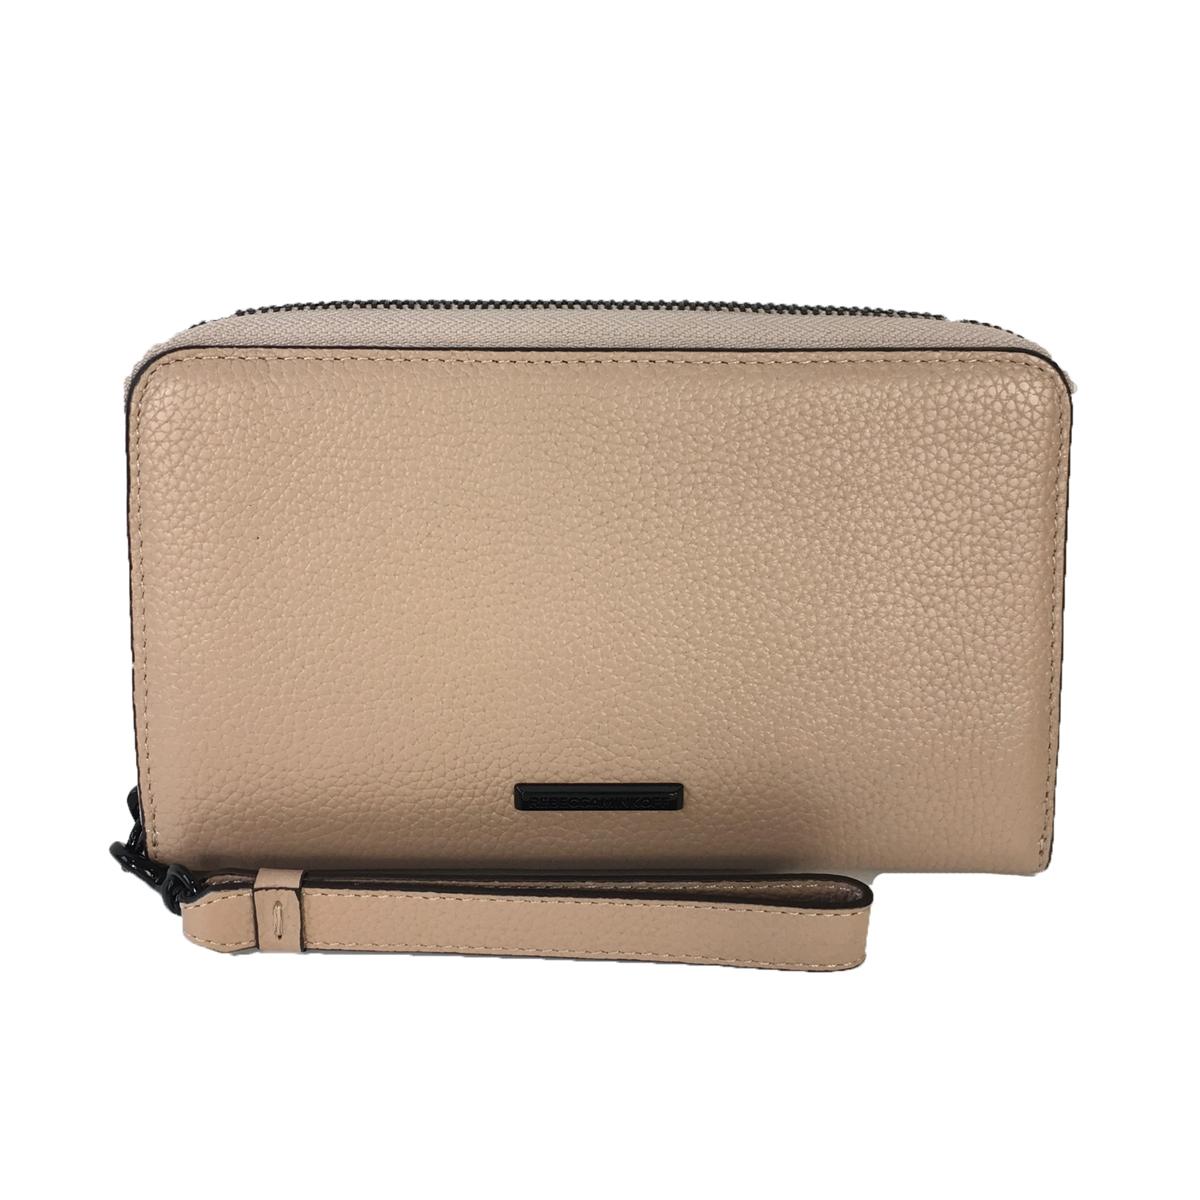 new product 9cad3 cfab4 Rebecca Minkoff Regan Universal iPhone Plus Leather Wristlet Wallet, Nude